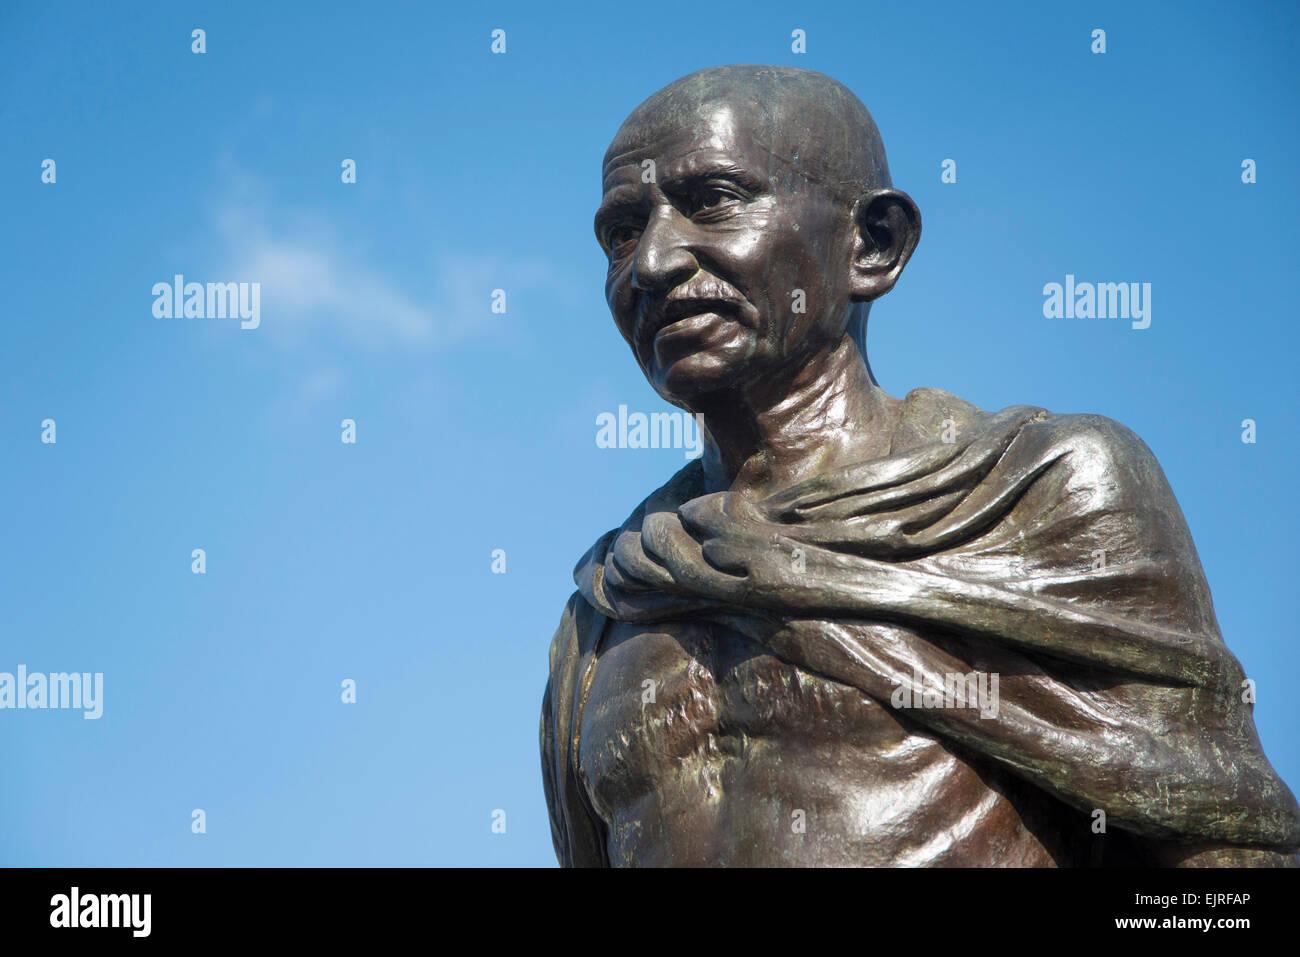 Mahatma Gandhi statue, Paramaribo, Suriname - Stock Image